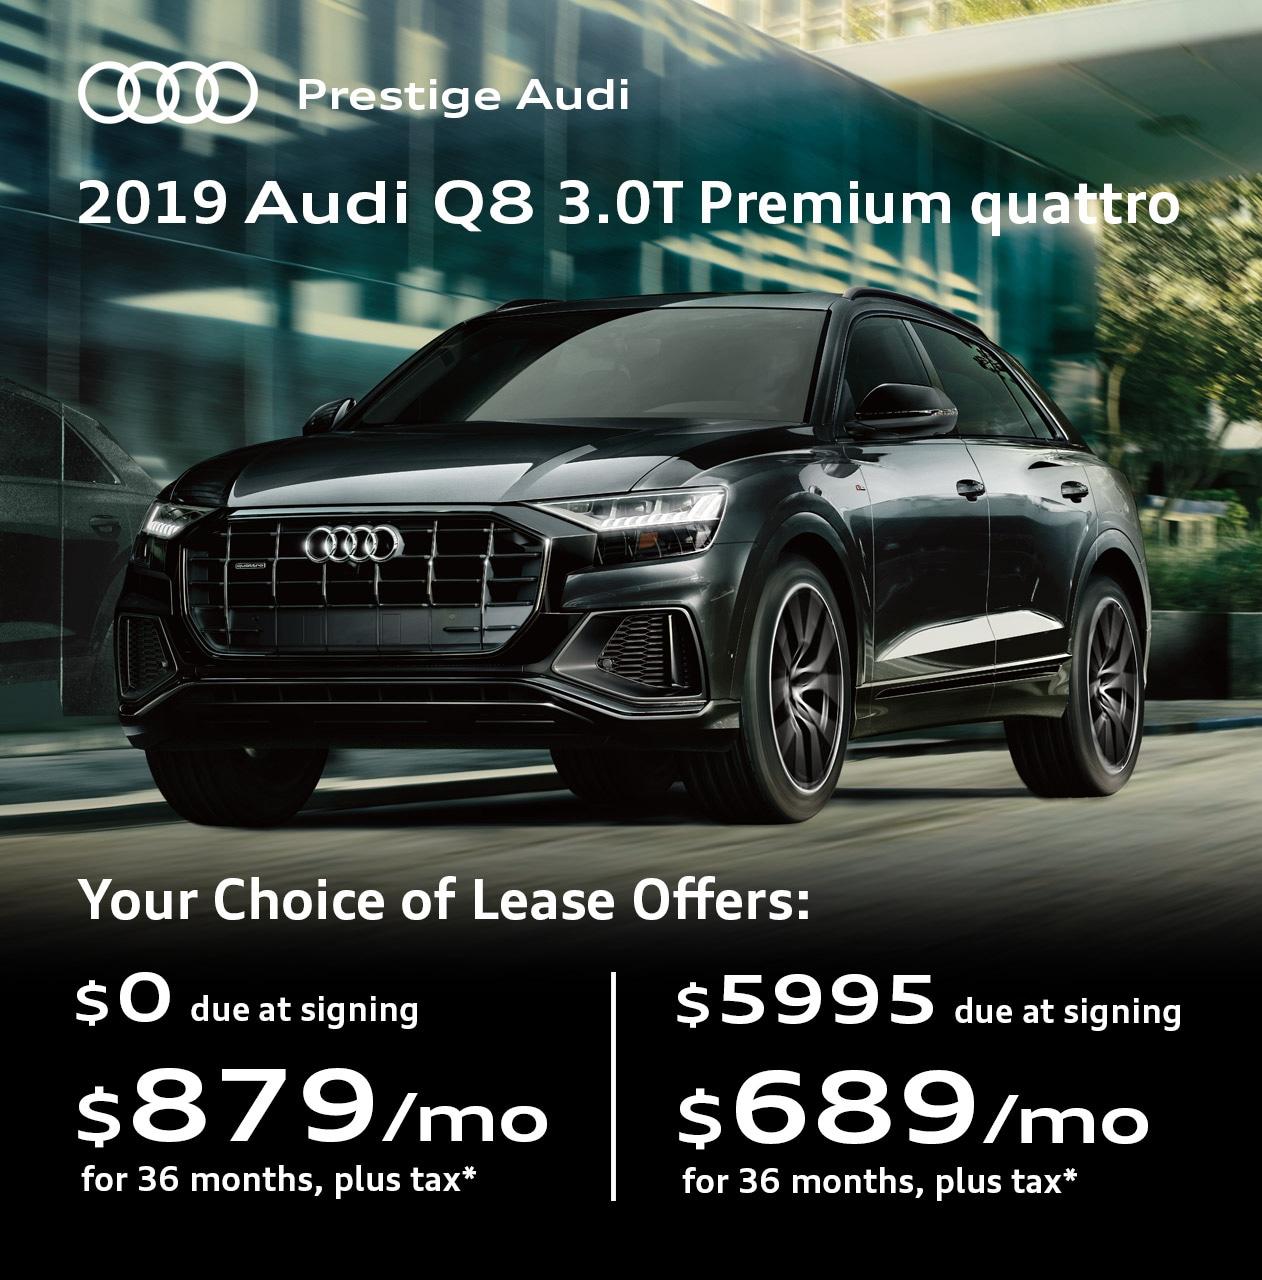 Audi Lease Offer: Lease Deals & Offers At Prestige Audi Near